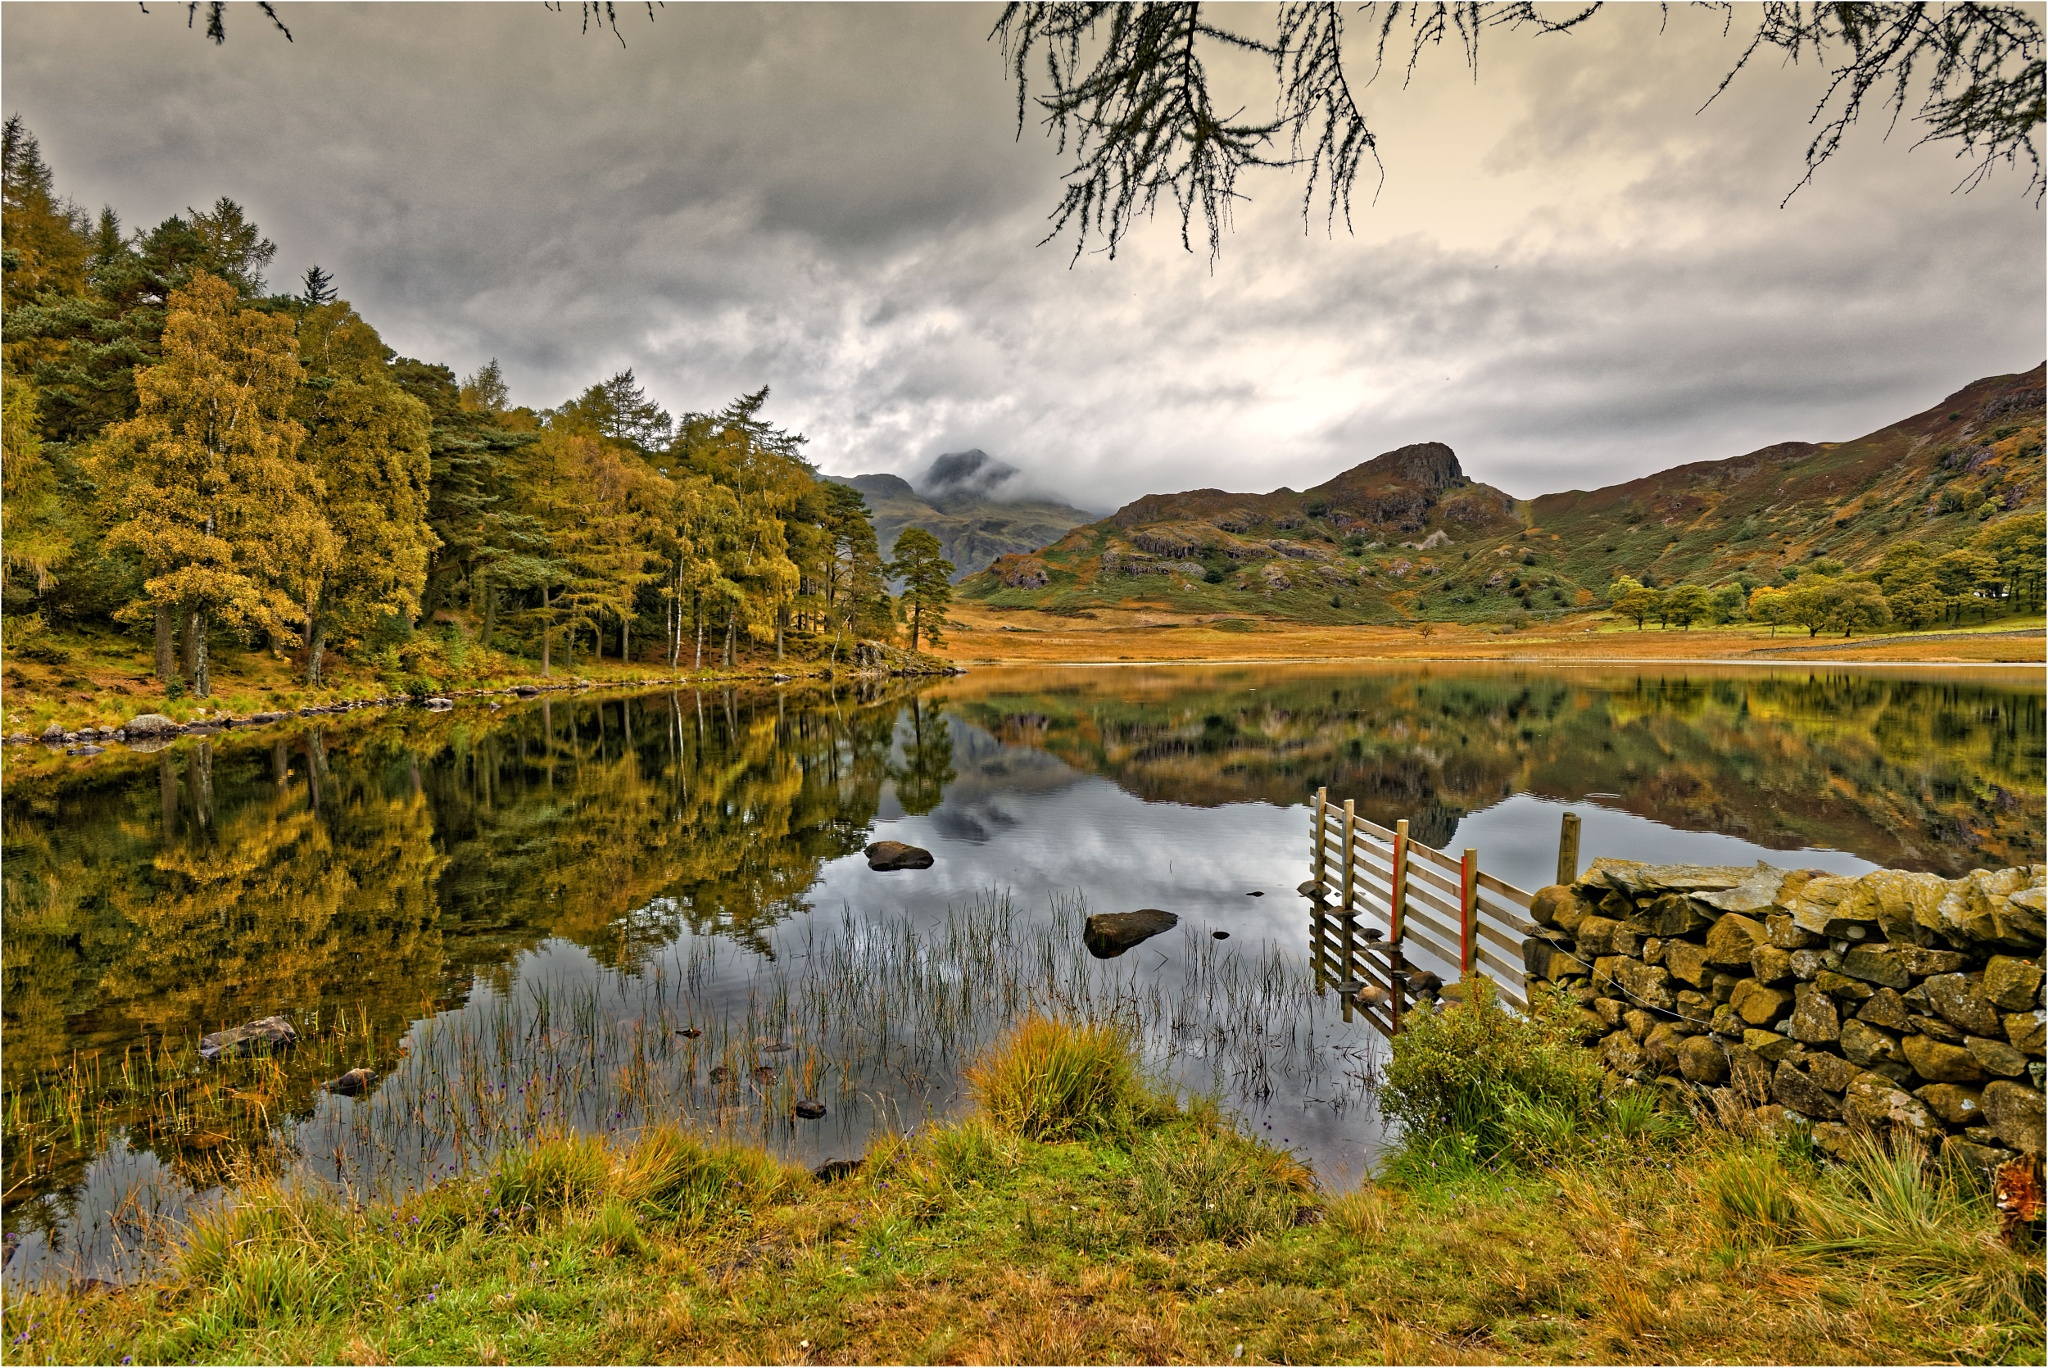 Blea Tarn Lake District Cumbria UK by paul.richards.1088